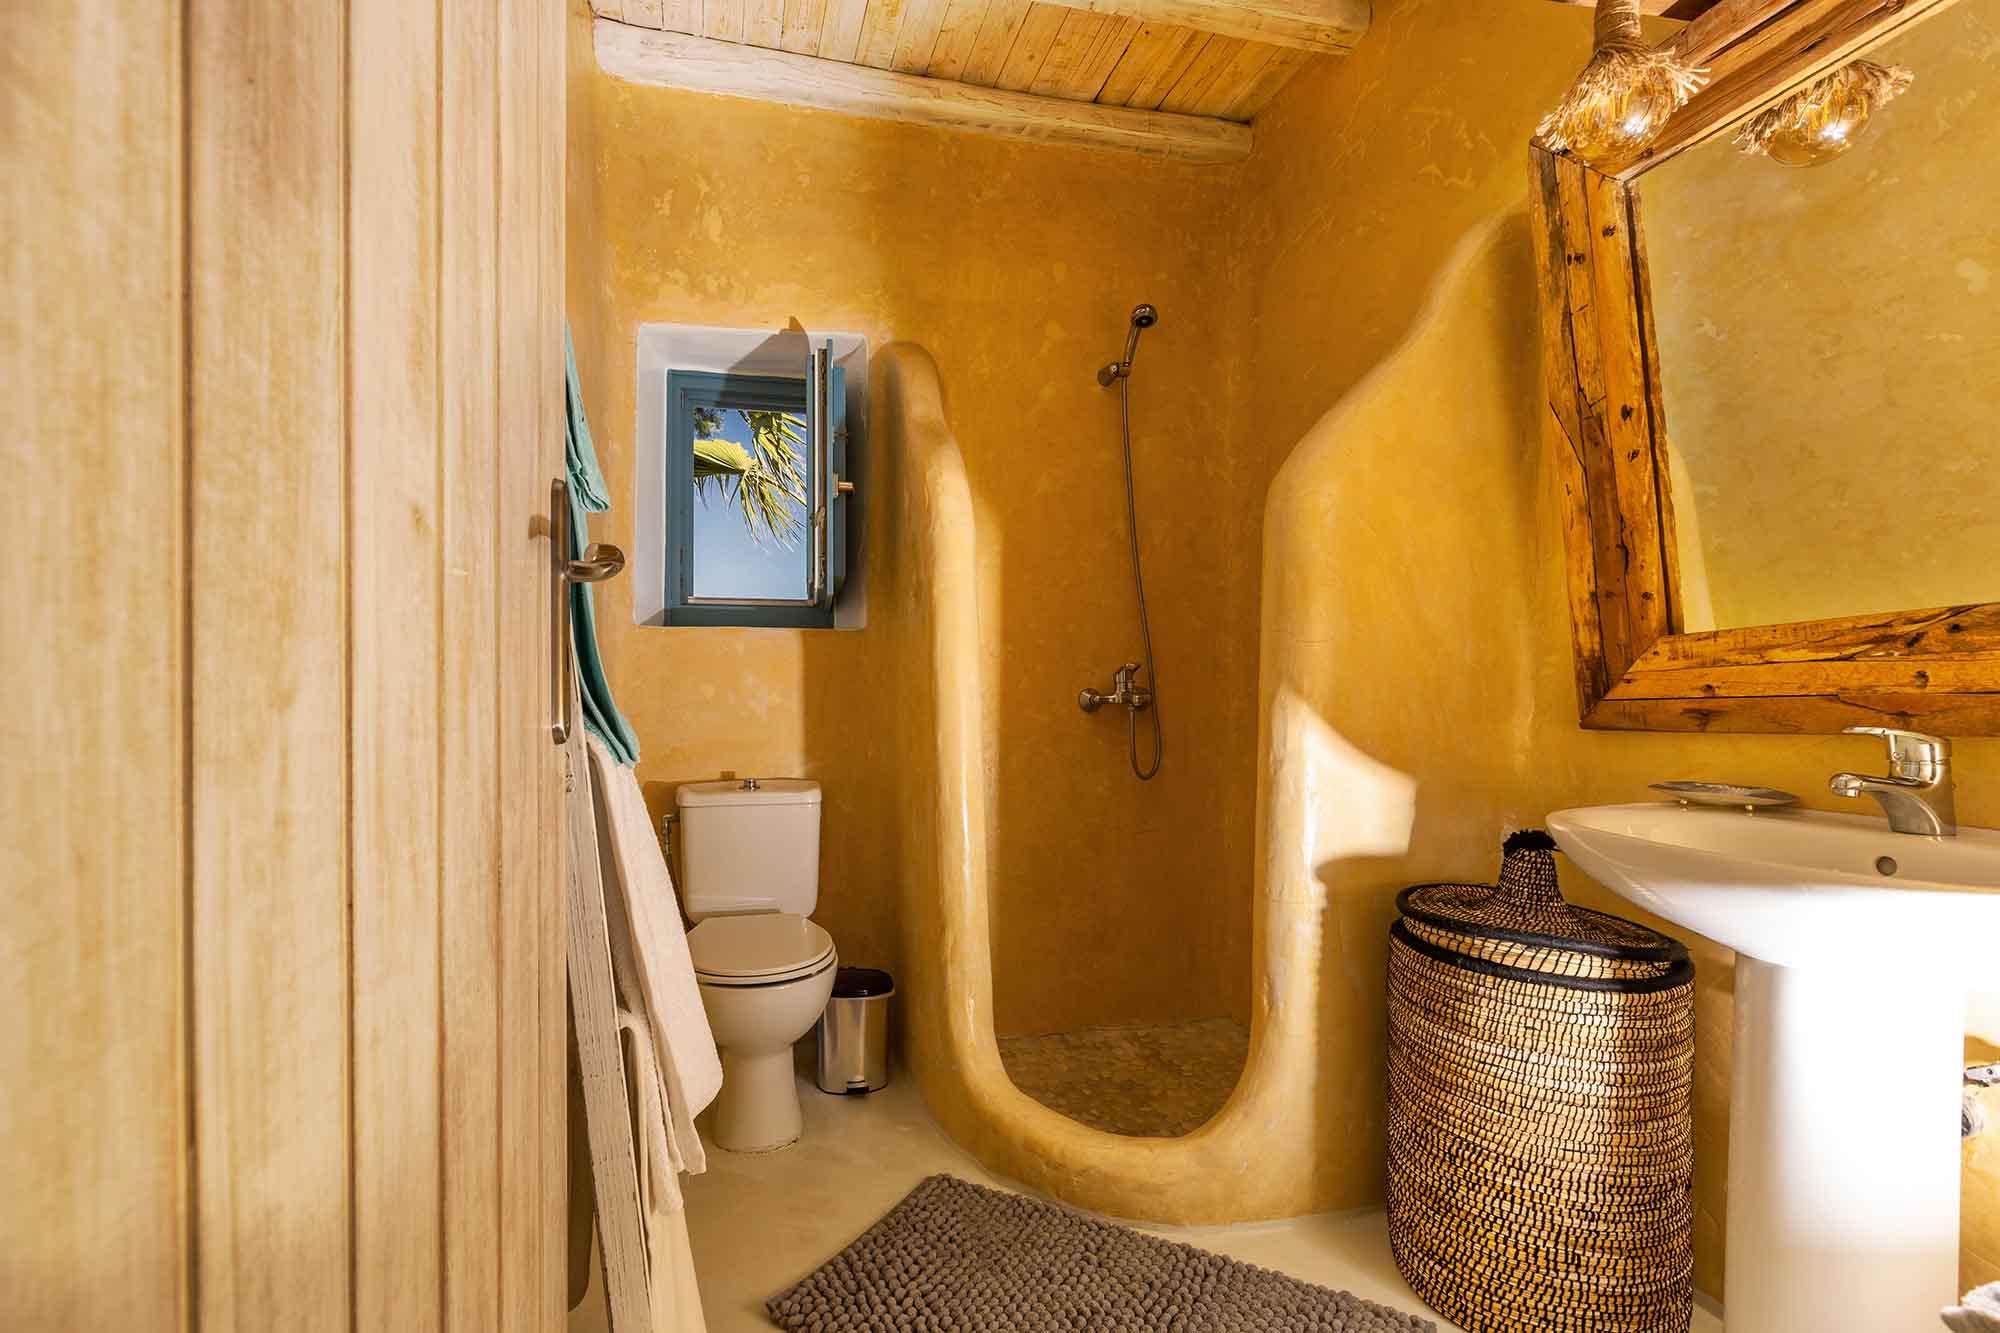 RENT A LUXURIOUS VILLA BY THE SEA IN MYKONOS - VILLA KARKOS - bathroom